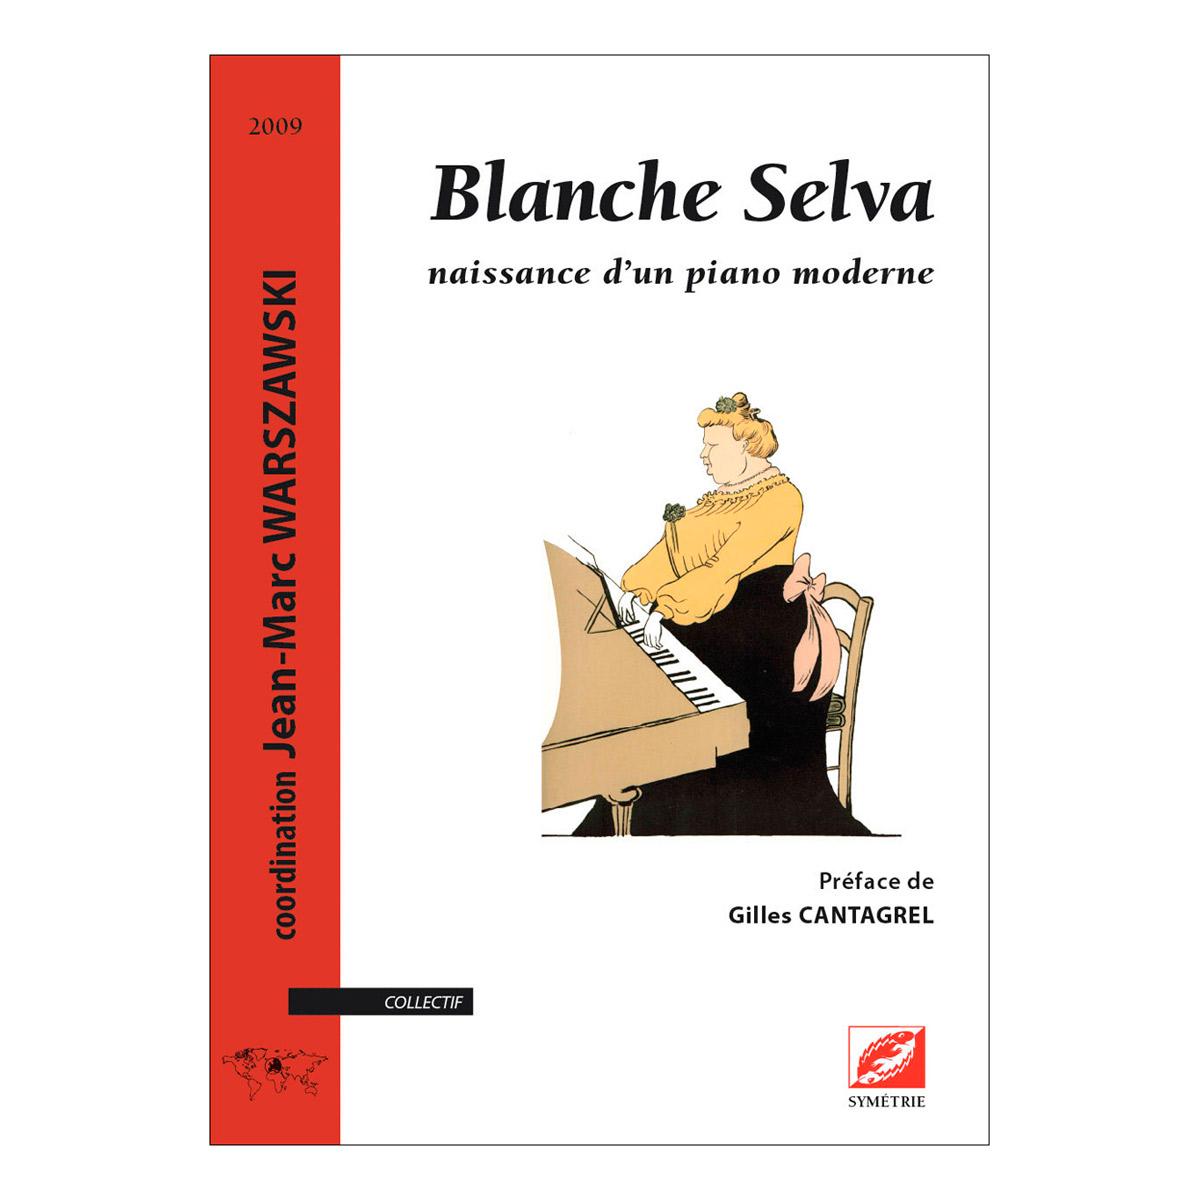 Warszawski J.m. - Blanche Selva, Naissance D'un Piano Moderne - Biographie